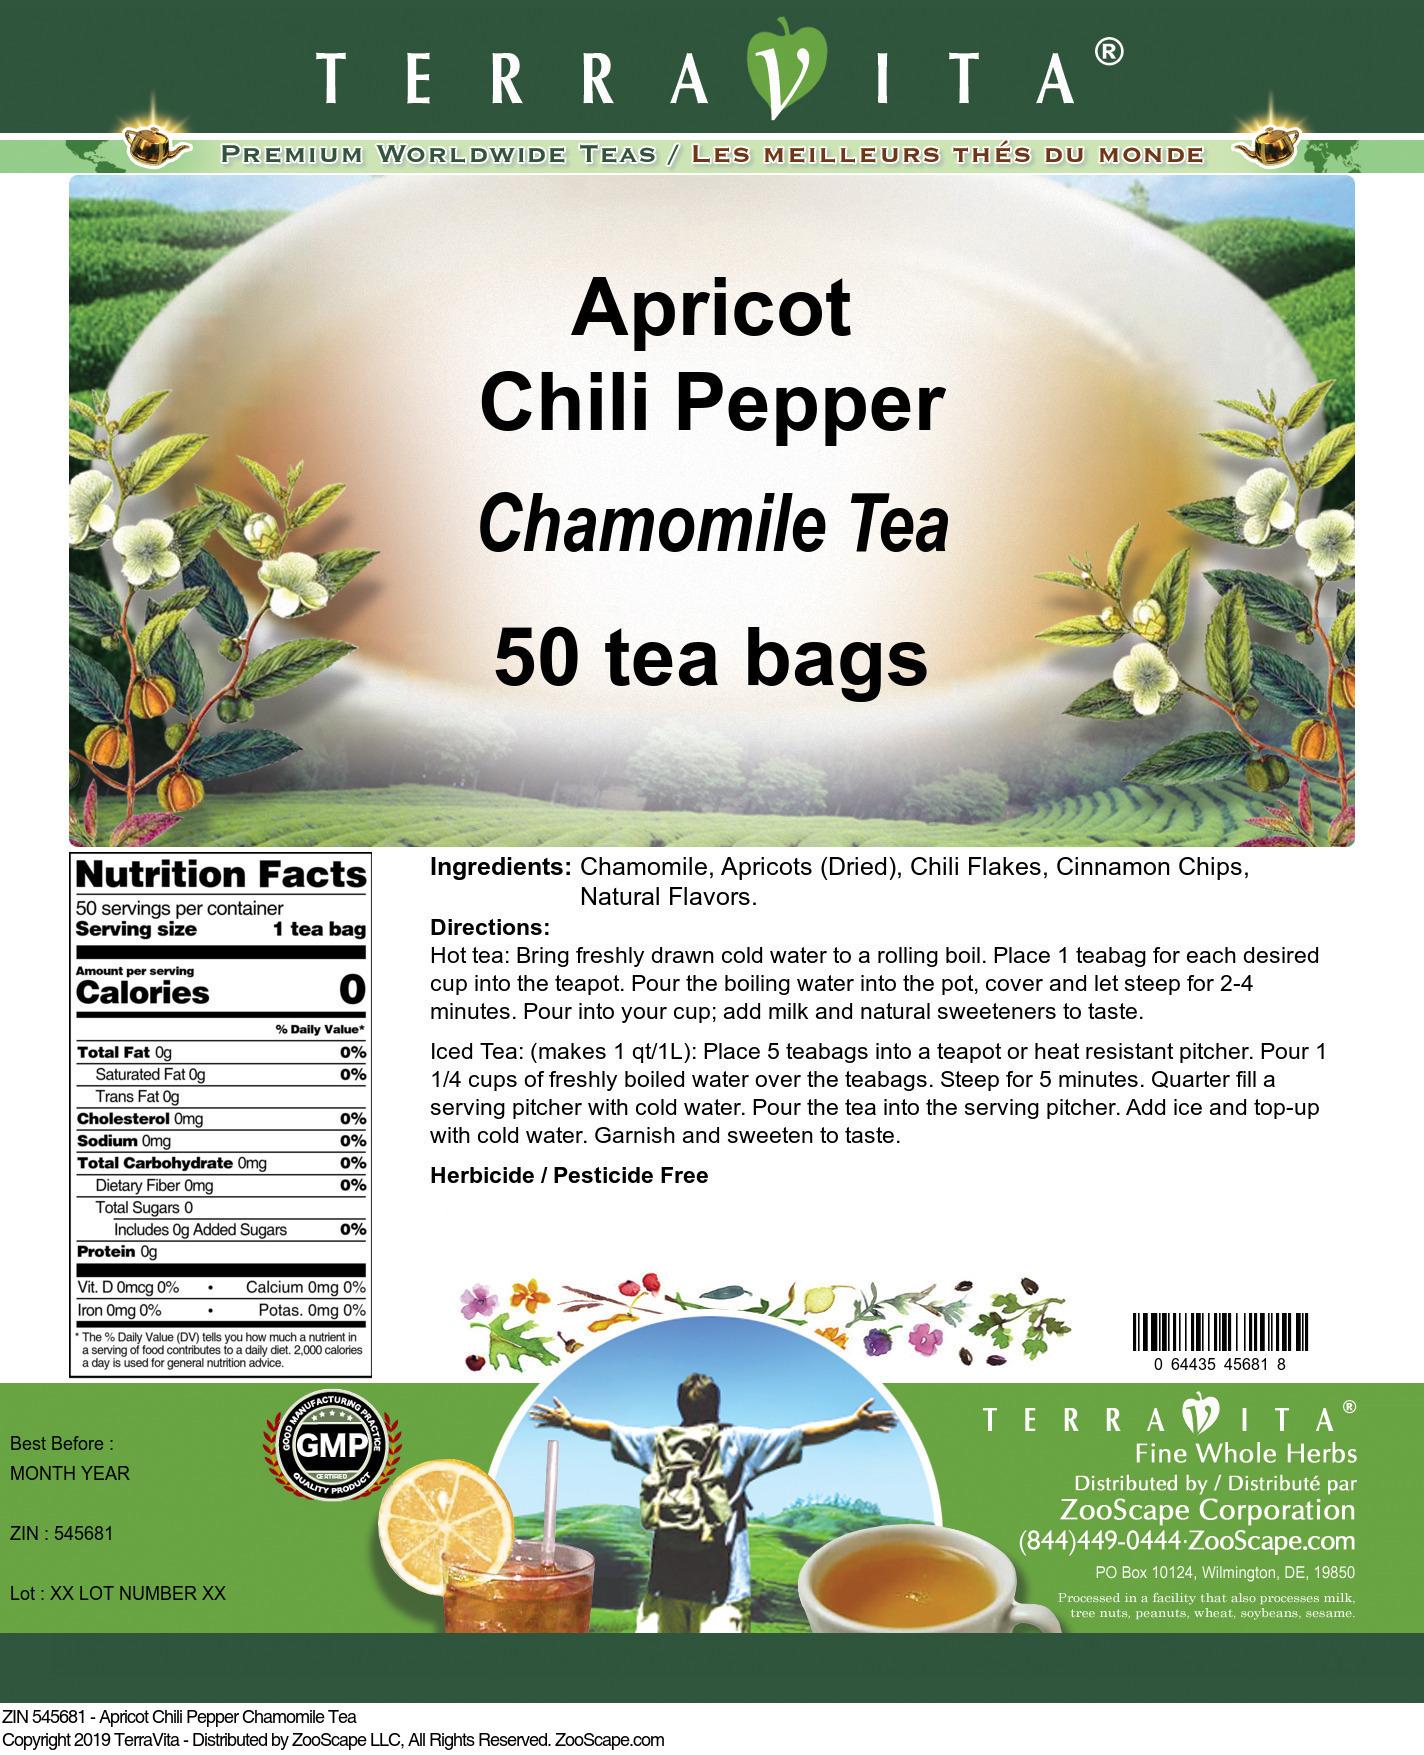 Apricot Chili Pepper Chamomile Tea